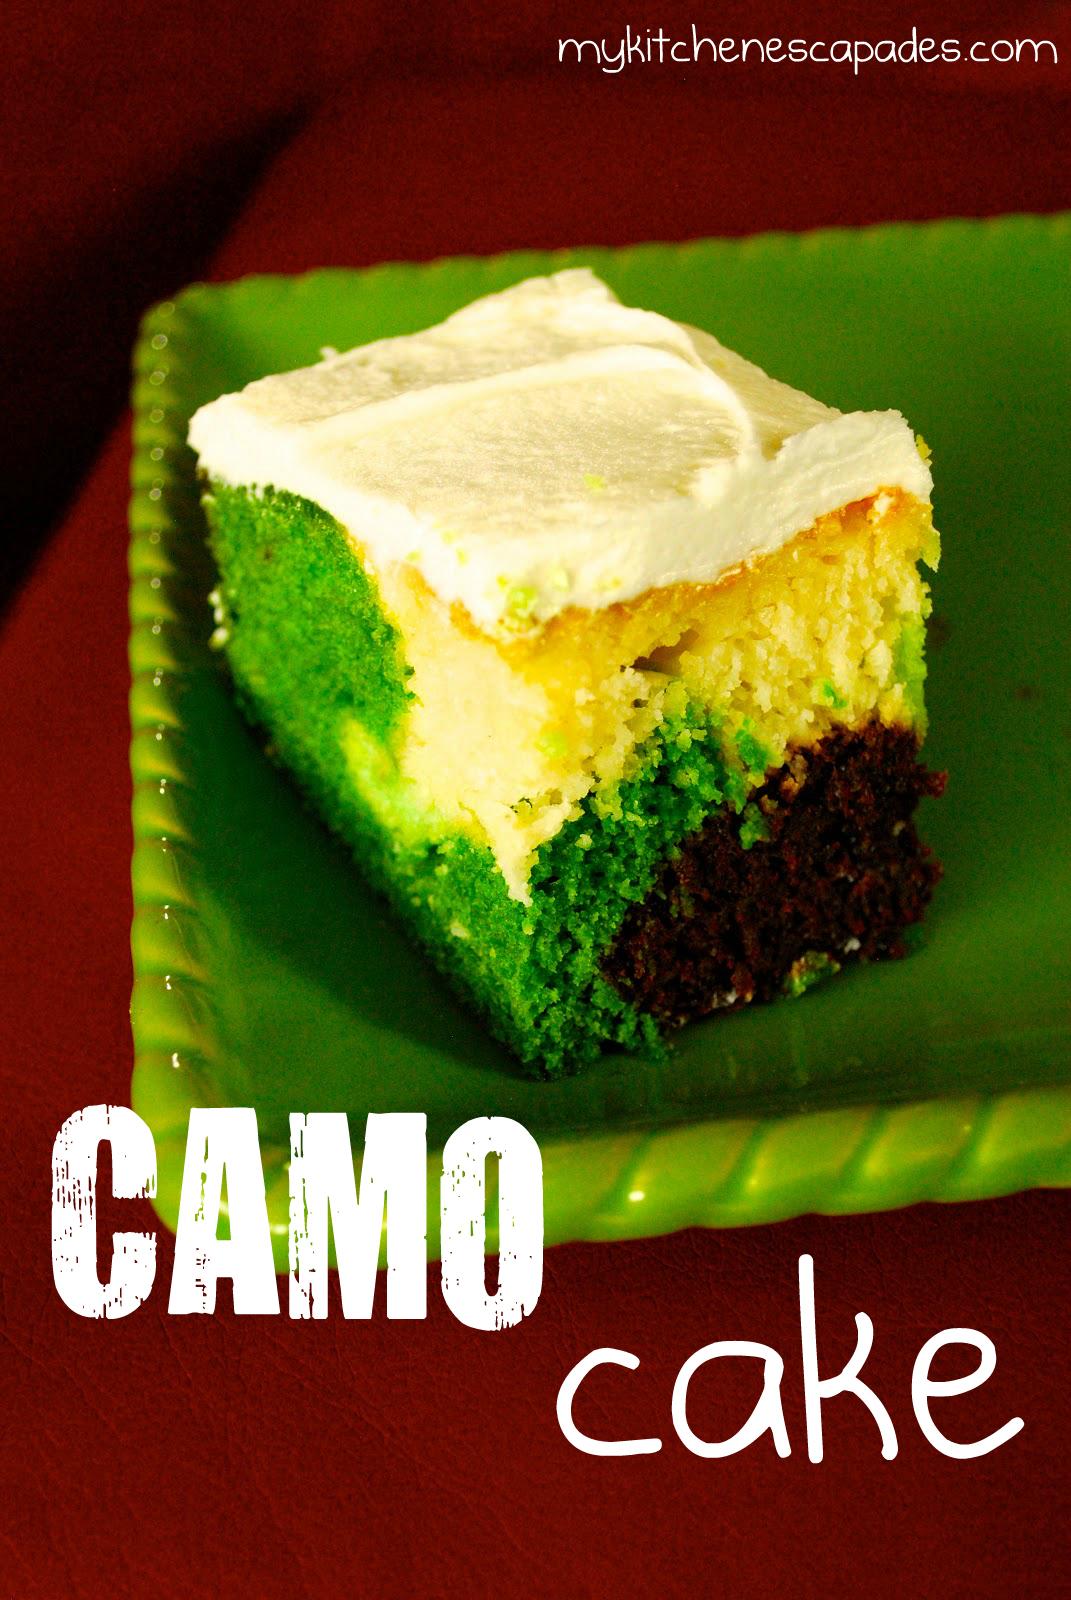 Camouflage Camo Cake